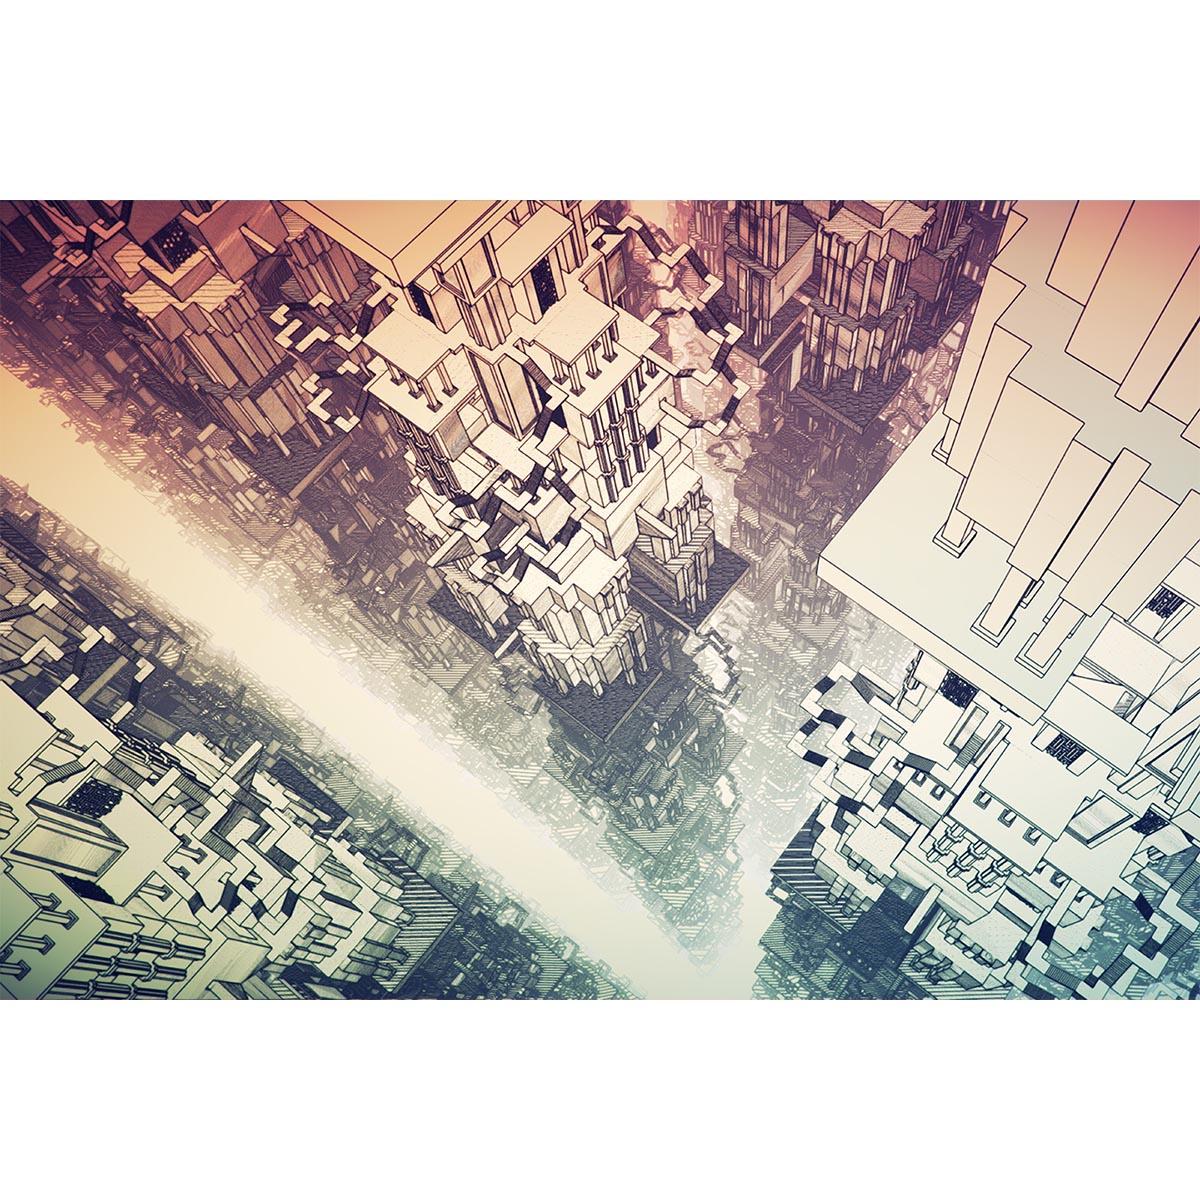 Infinite Architecture No. 2 by William Chyr